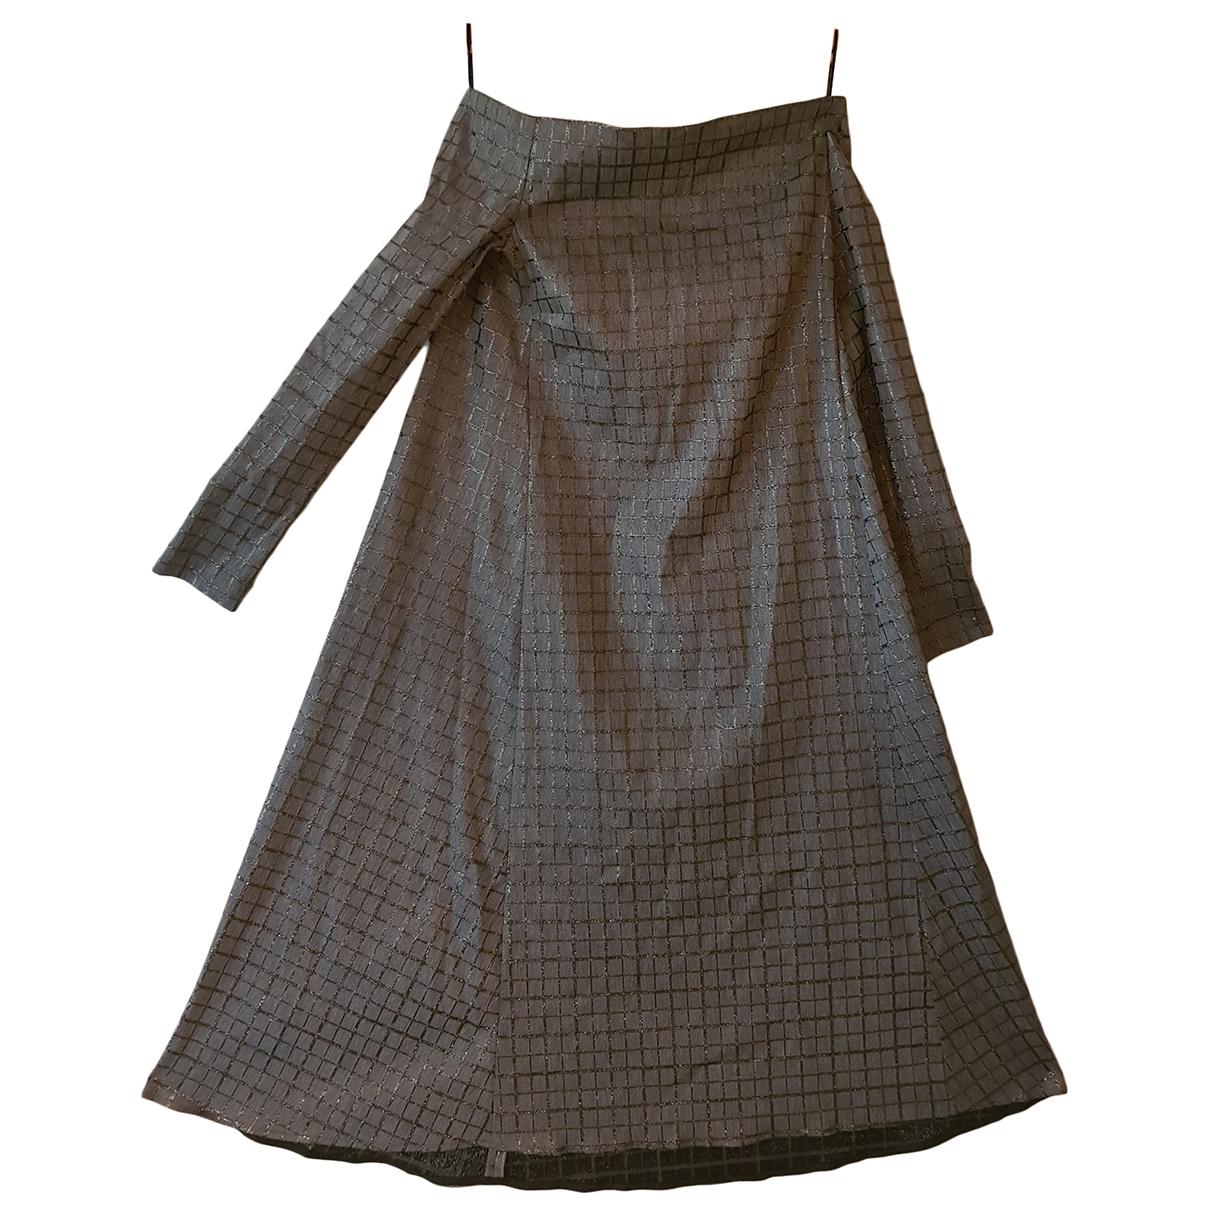 Scanlan & Theodore - Robe   pour femme - argente